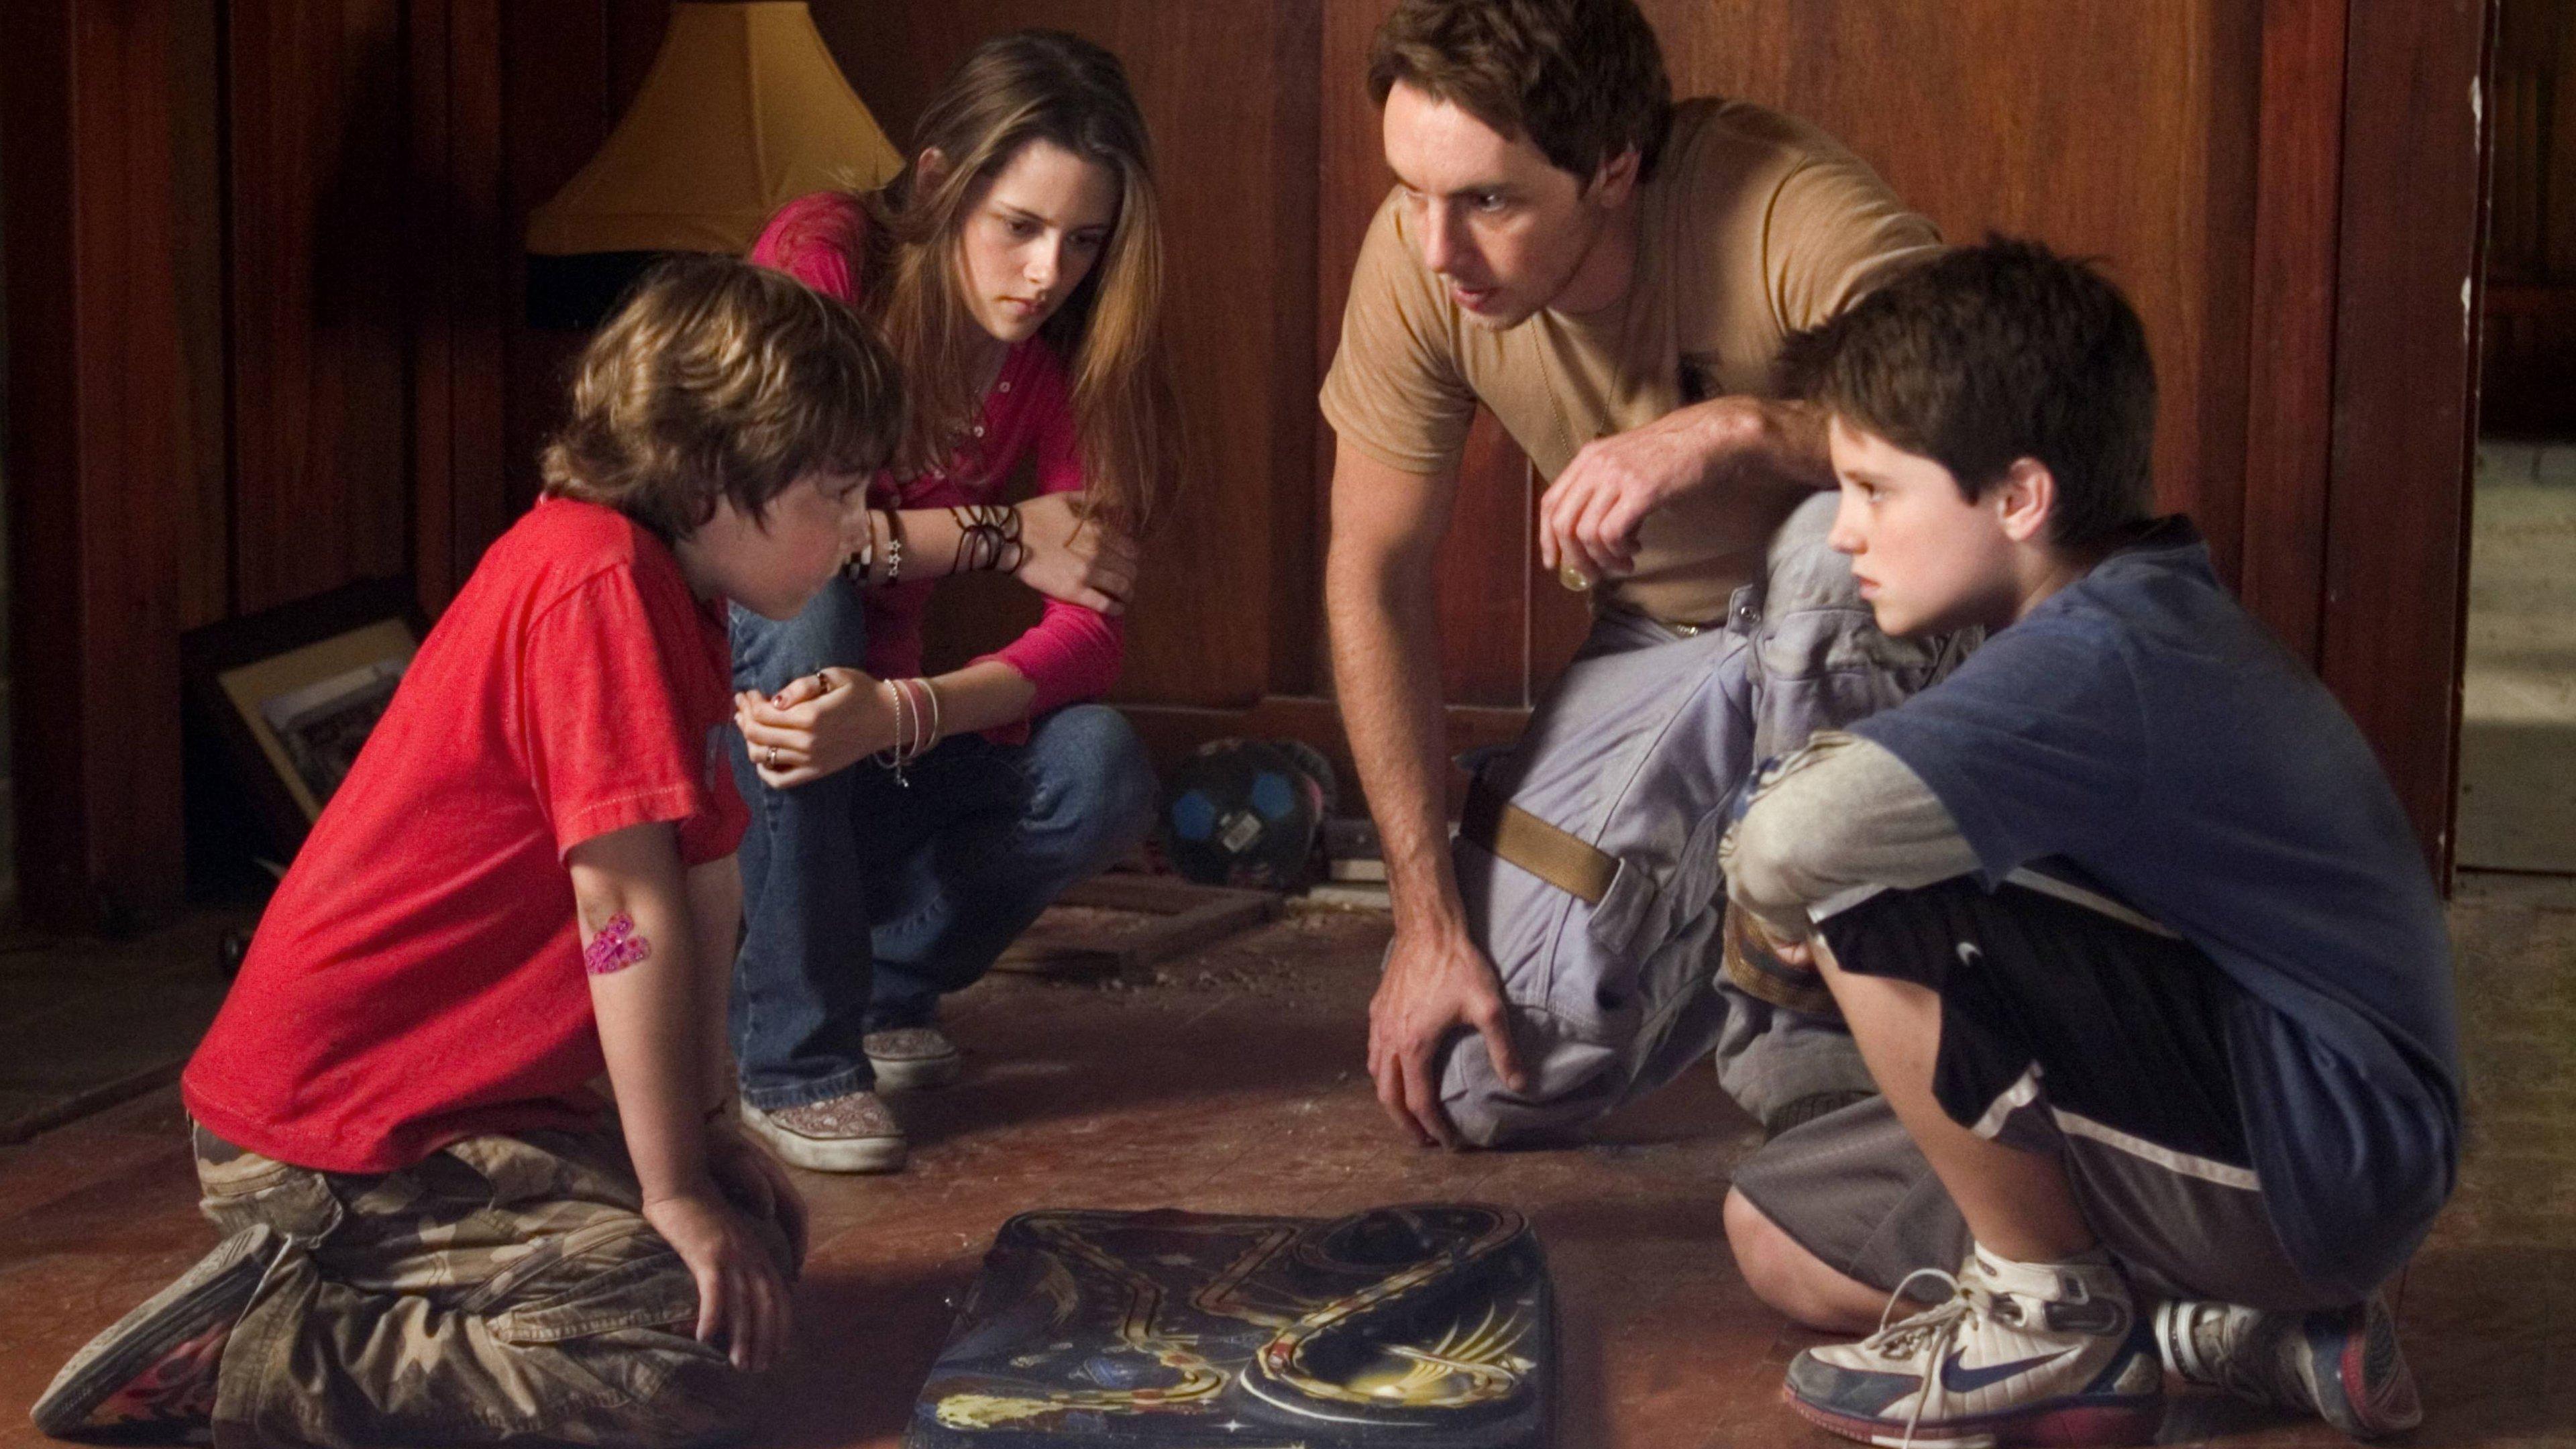 (l to r) Jonah Bobo, Kristen Stewart, Dax Shepard and Jush Hutcherson set down to play Zathura: A Space Adventure (2005)